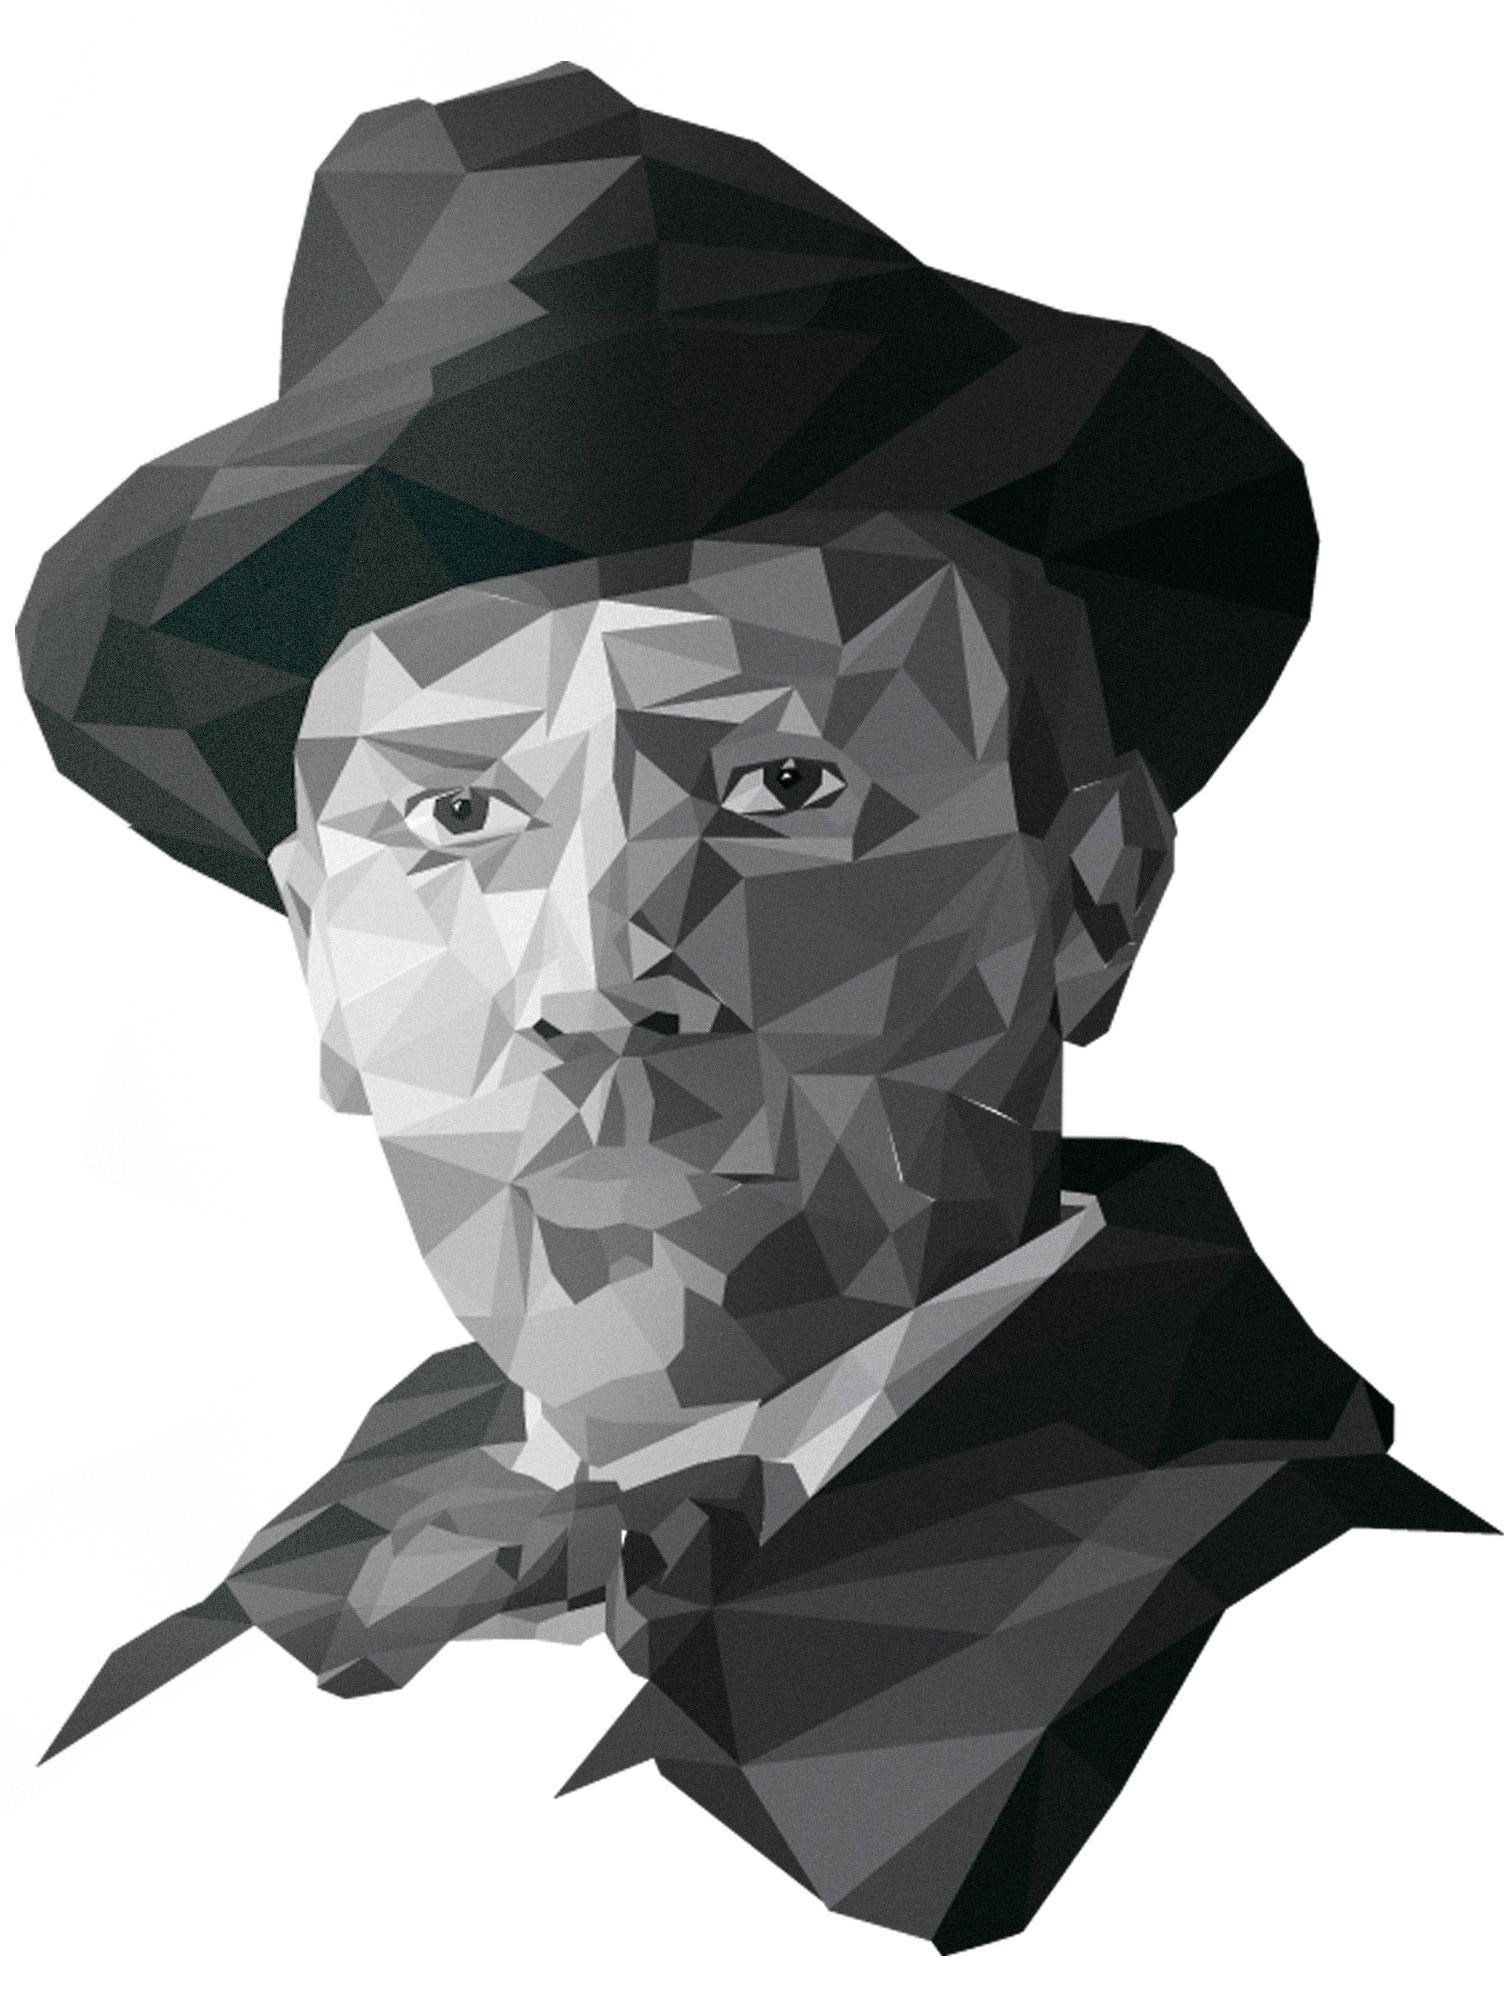 Плакат-портрет Михаила Булгакова - дизайнер NurlanT